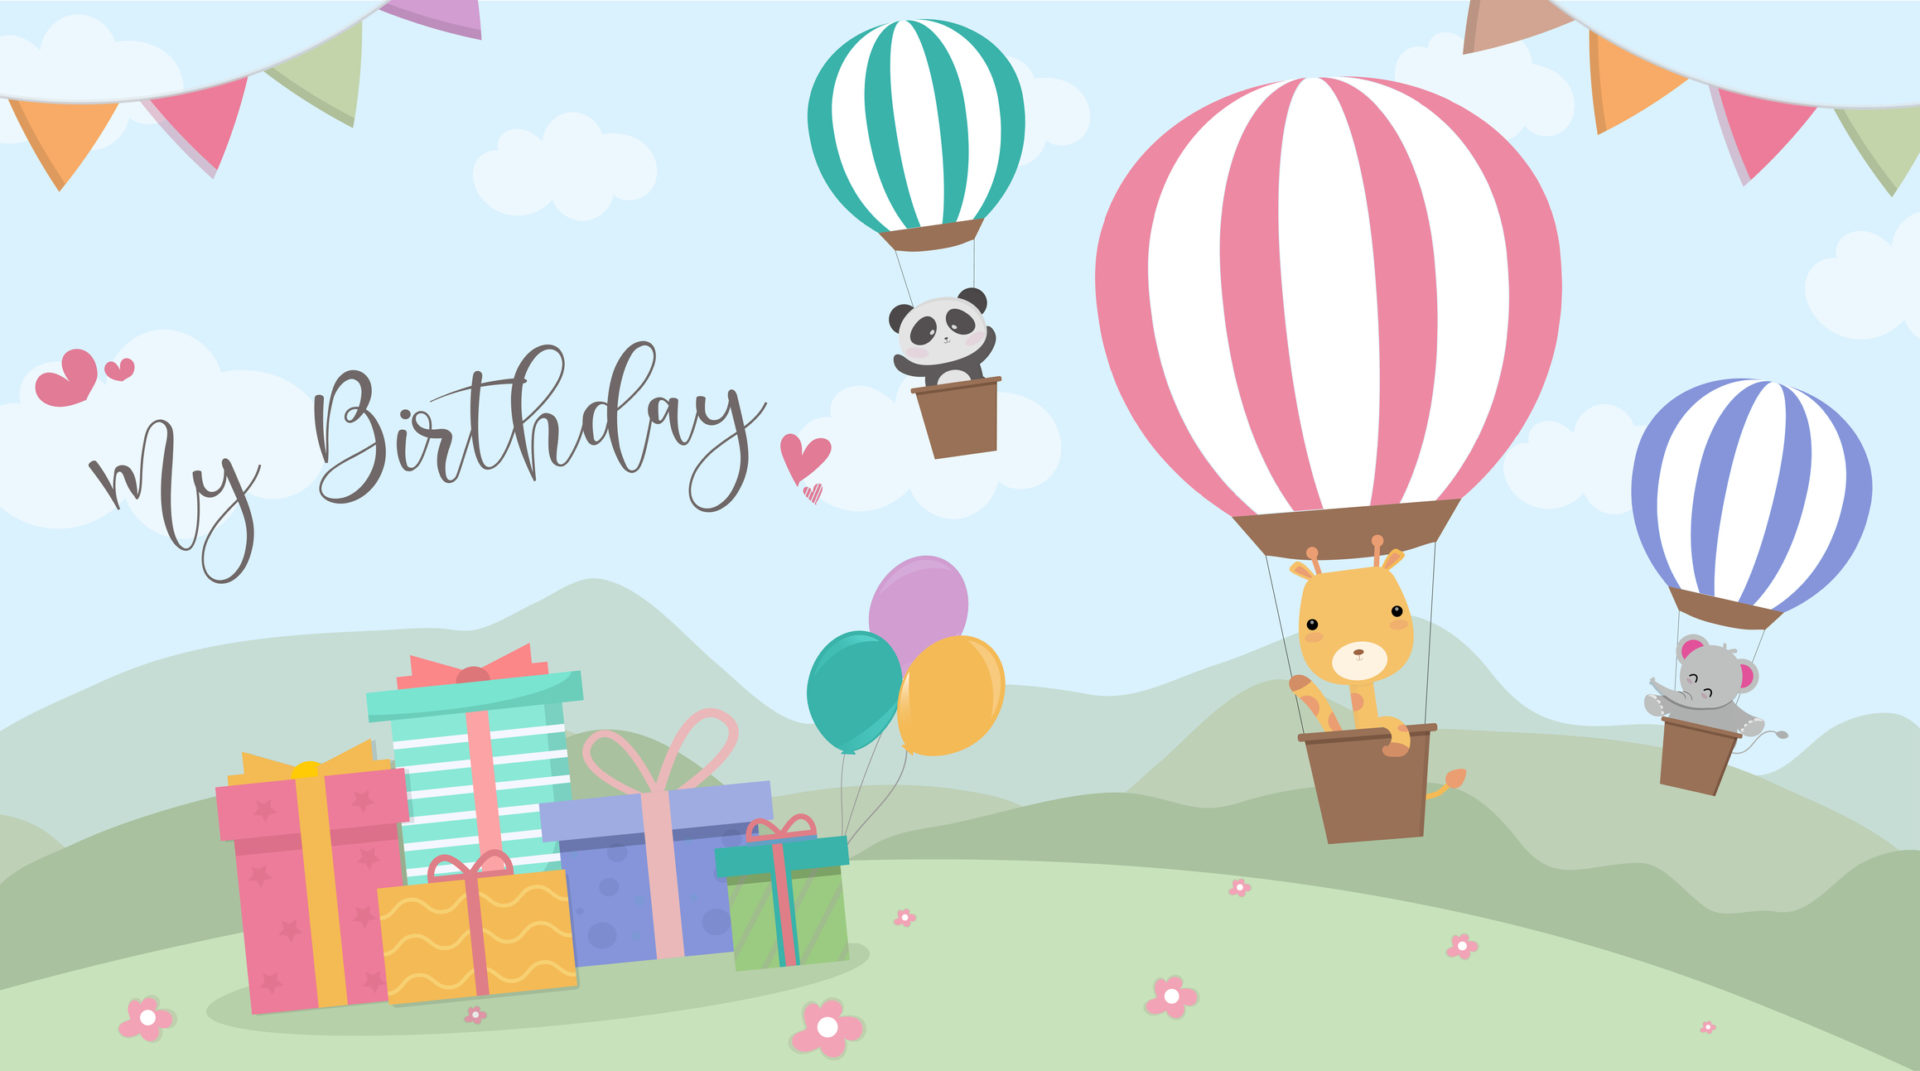 Happy Birthday cartoon card with air balloons,